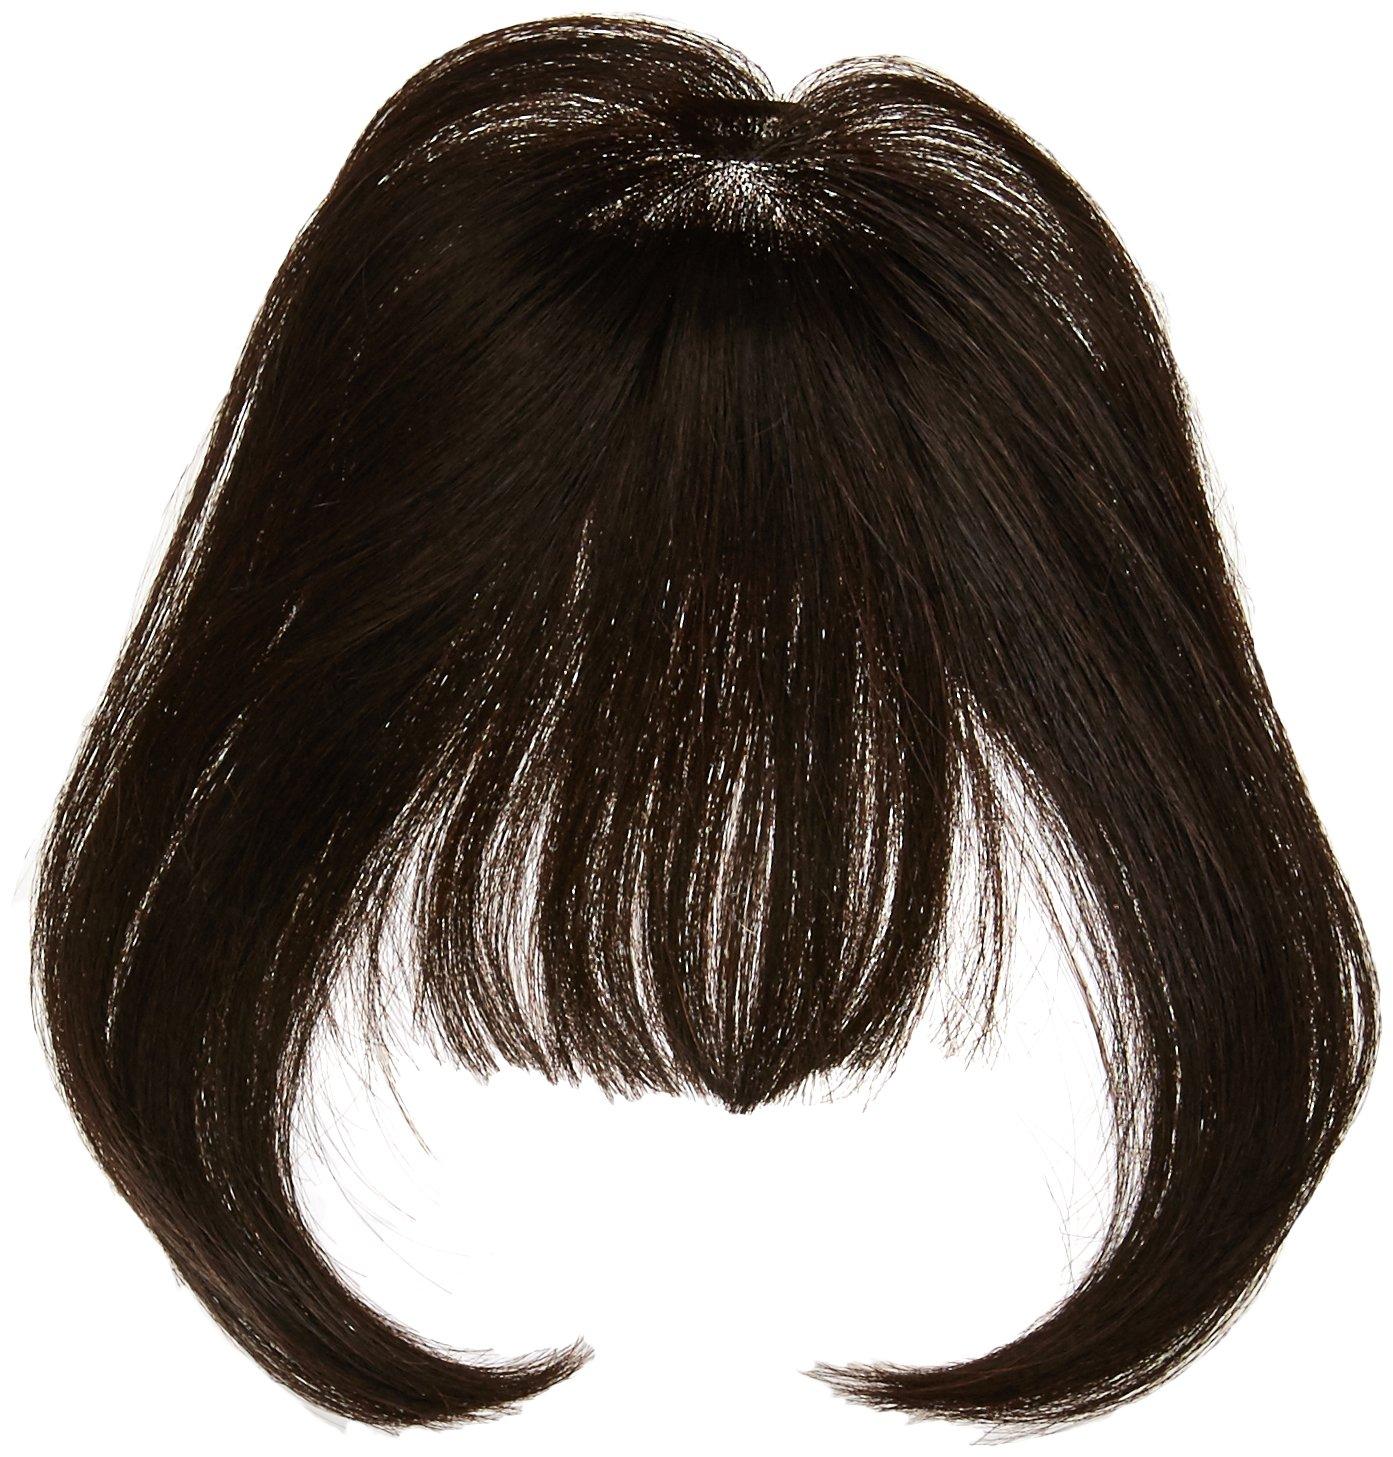 Amazon Human Hair Bangs Color R1hh Black Hairdo Extensions 9